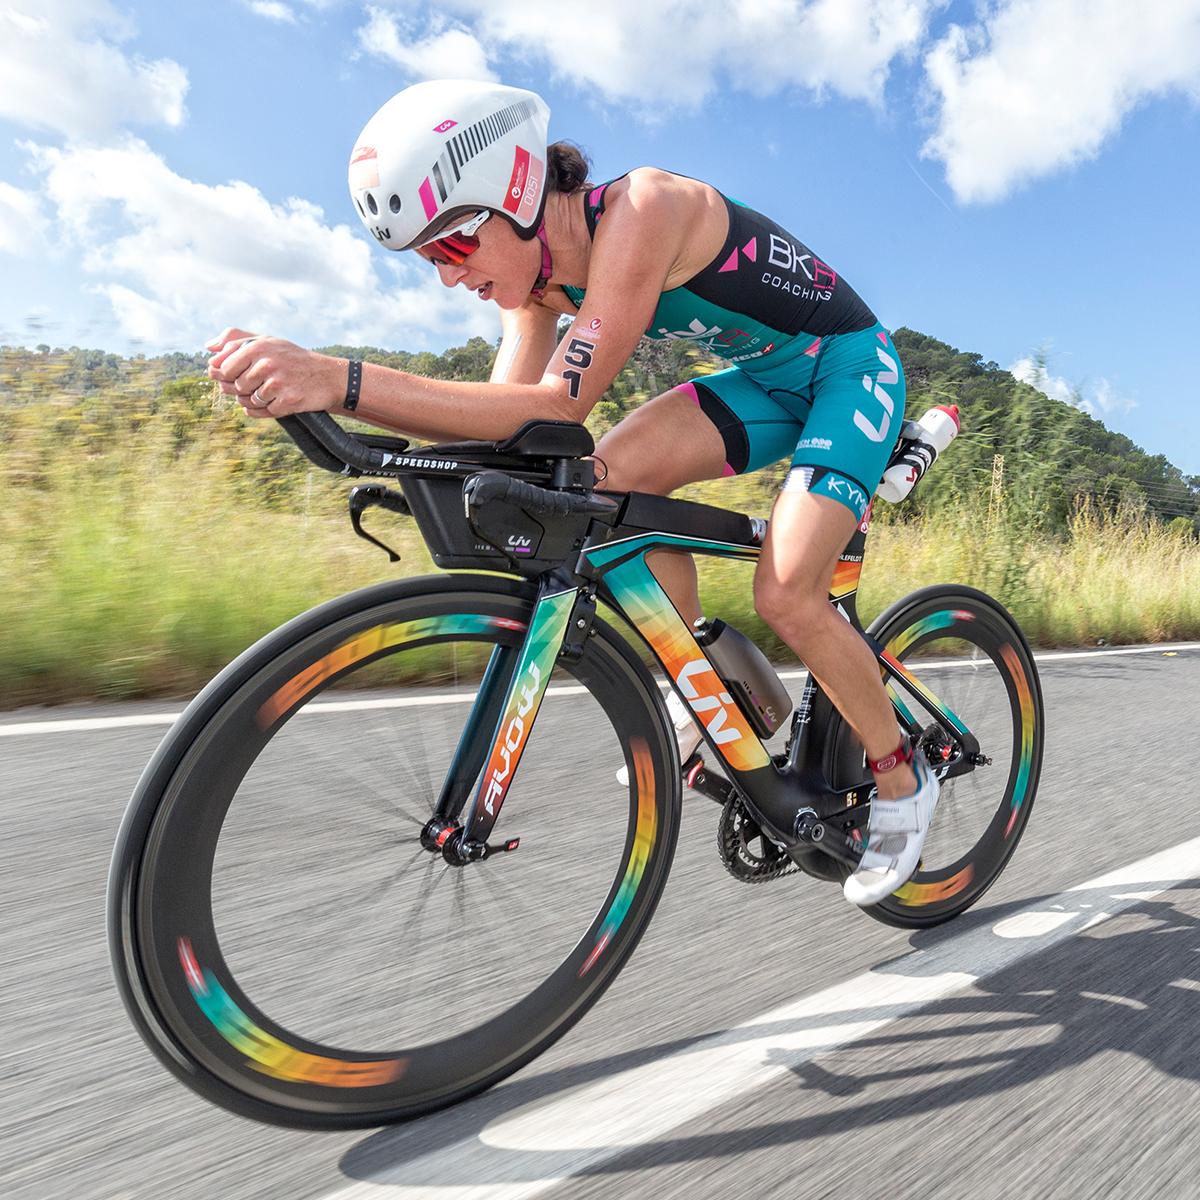 Bike - Challenge Peguera Mallorca race magazine 2020 triathlon